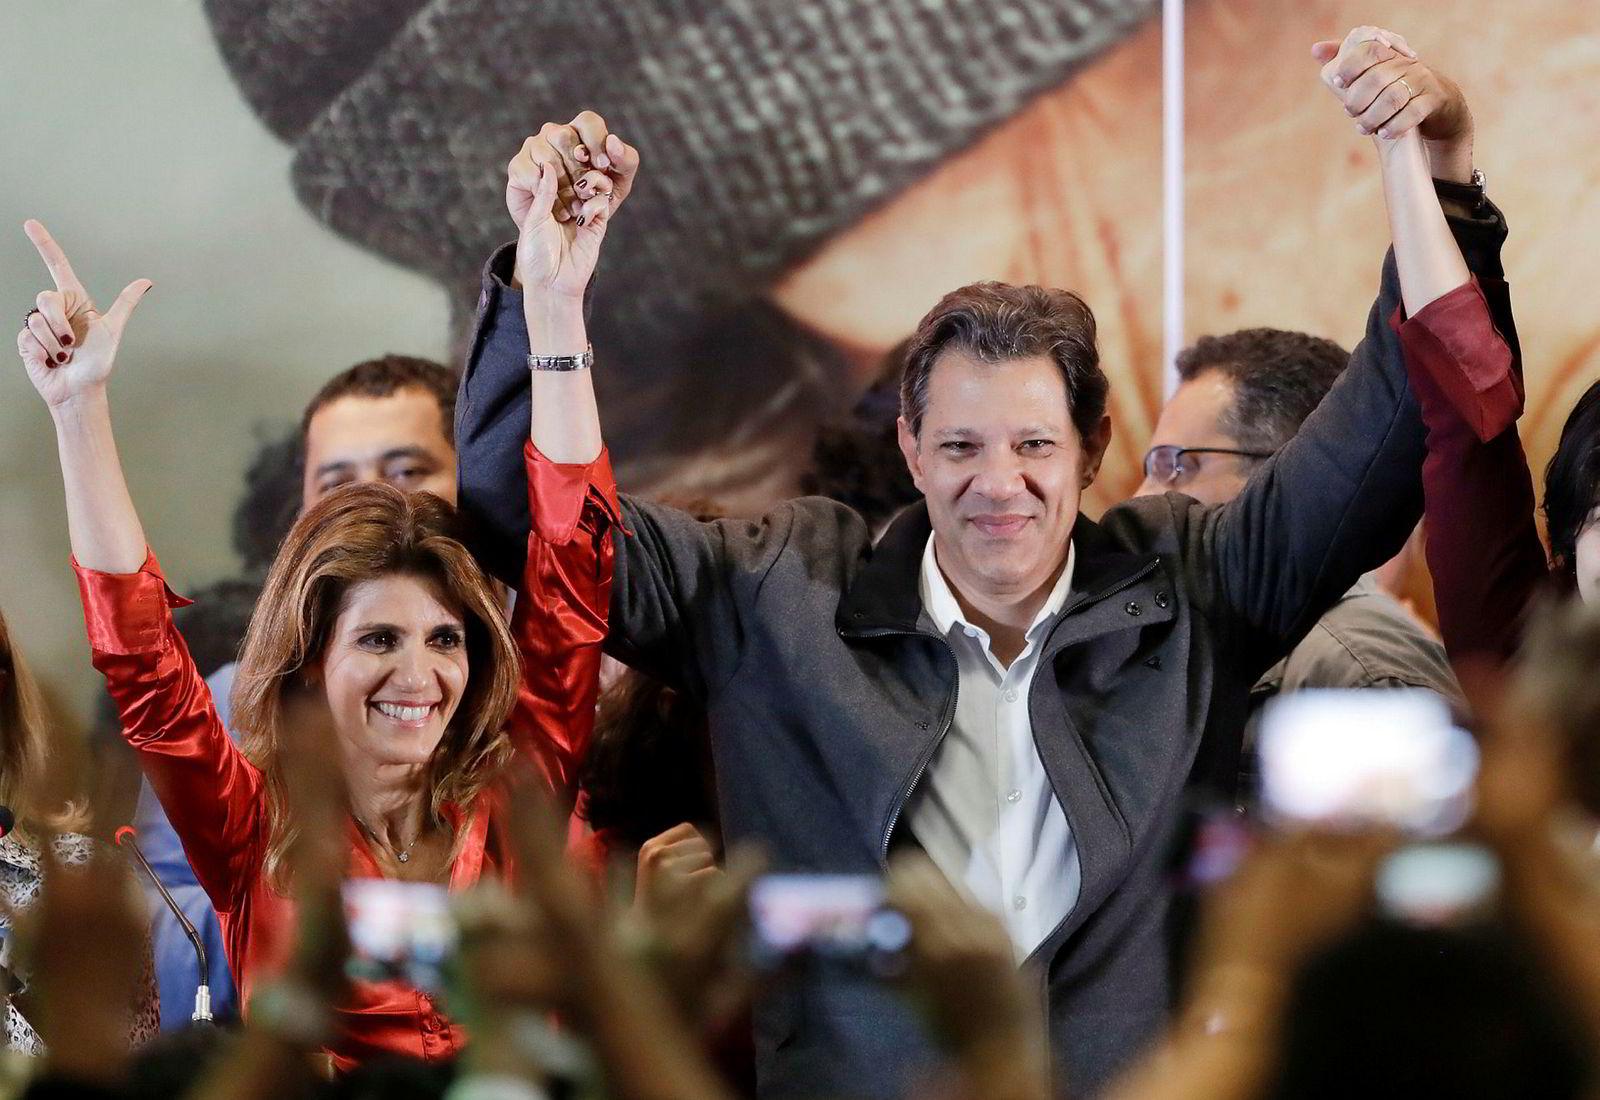 Fernando Haddad fra Arbeiderpartiet (pt) og hans kone Ana Estela Haddad jublet etter søndagens valgresultat. Haddad fikk 29 prosent av stemmene.